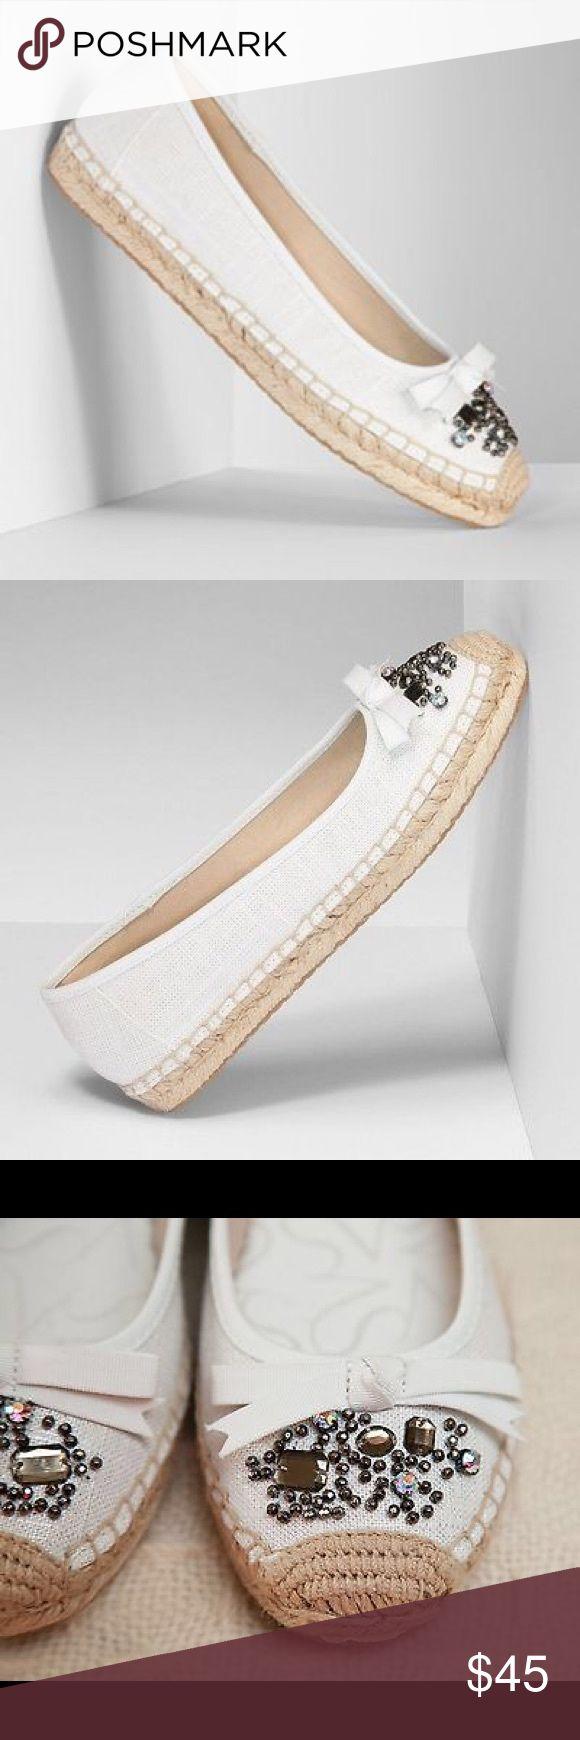 Vera Wang White Jeweled Espadrille Shoes Vera Wang white iridescent w/pewter jeweled stone espadrille shoes will have you looking fab! Vera Wang Shoes Espadrilles